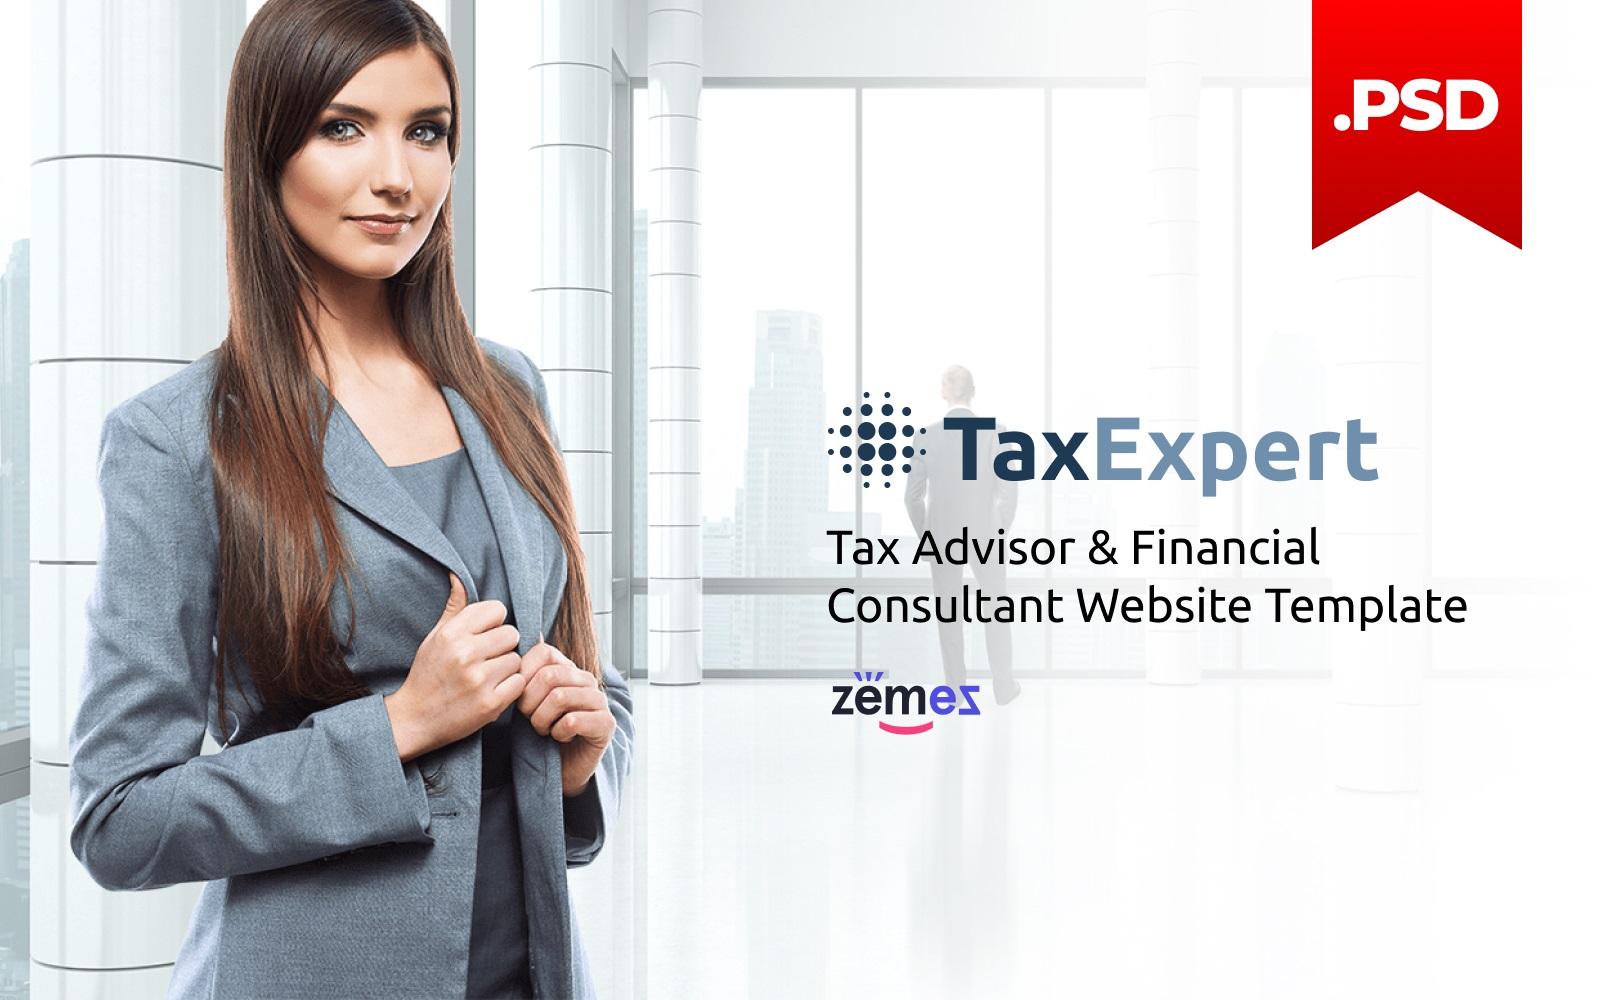 Reszponzív TaxExpert - Tax Advisor & Financial Consultant PSD sablon 116431